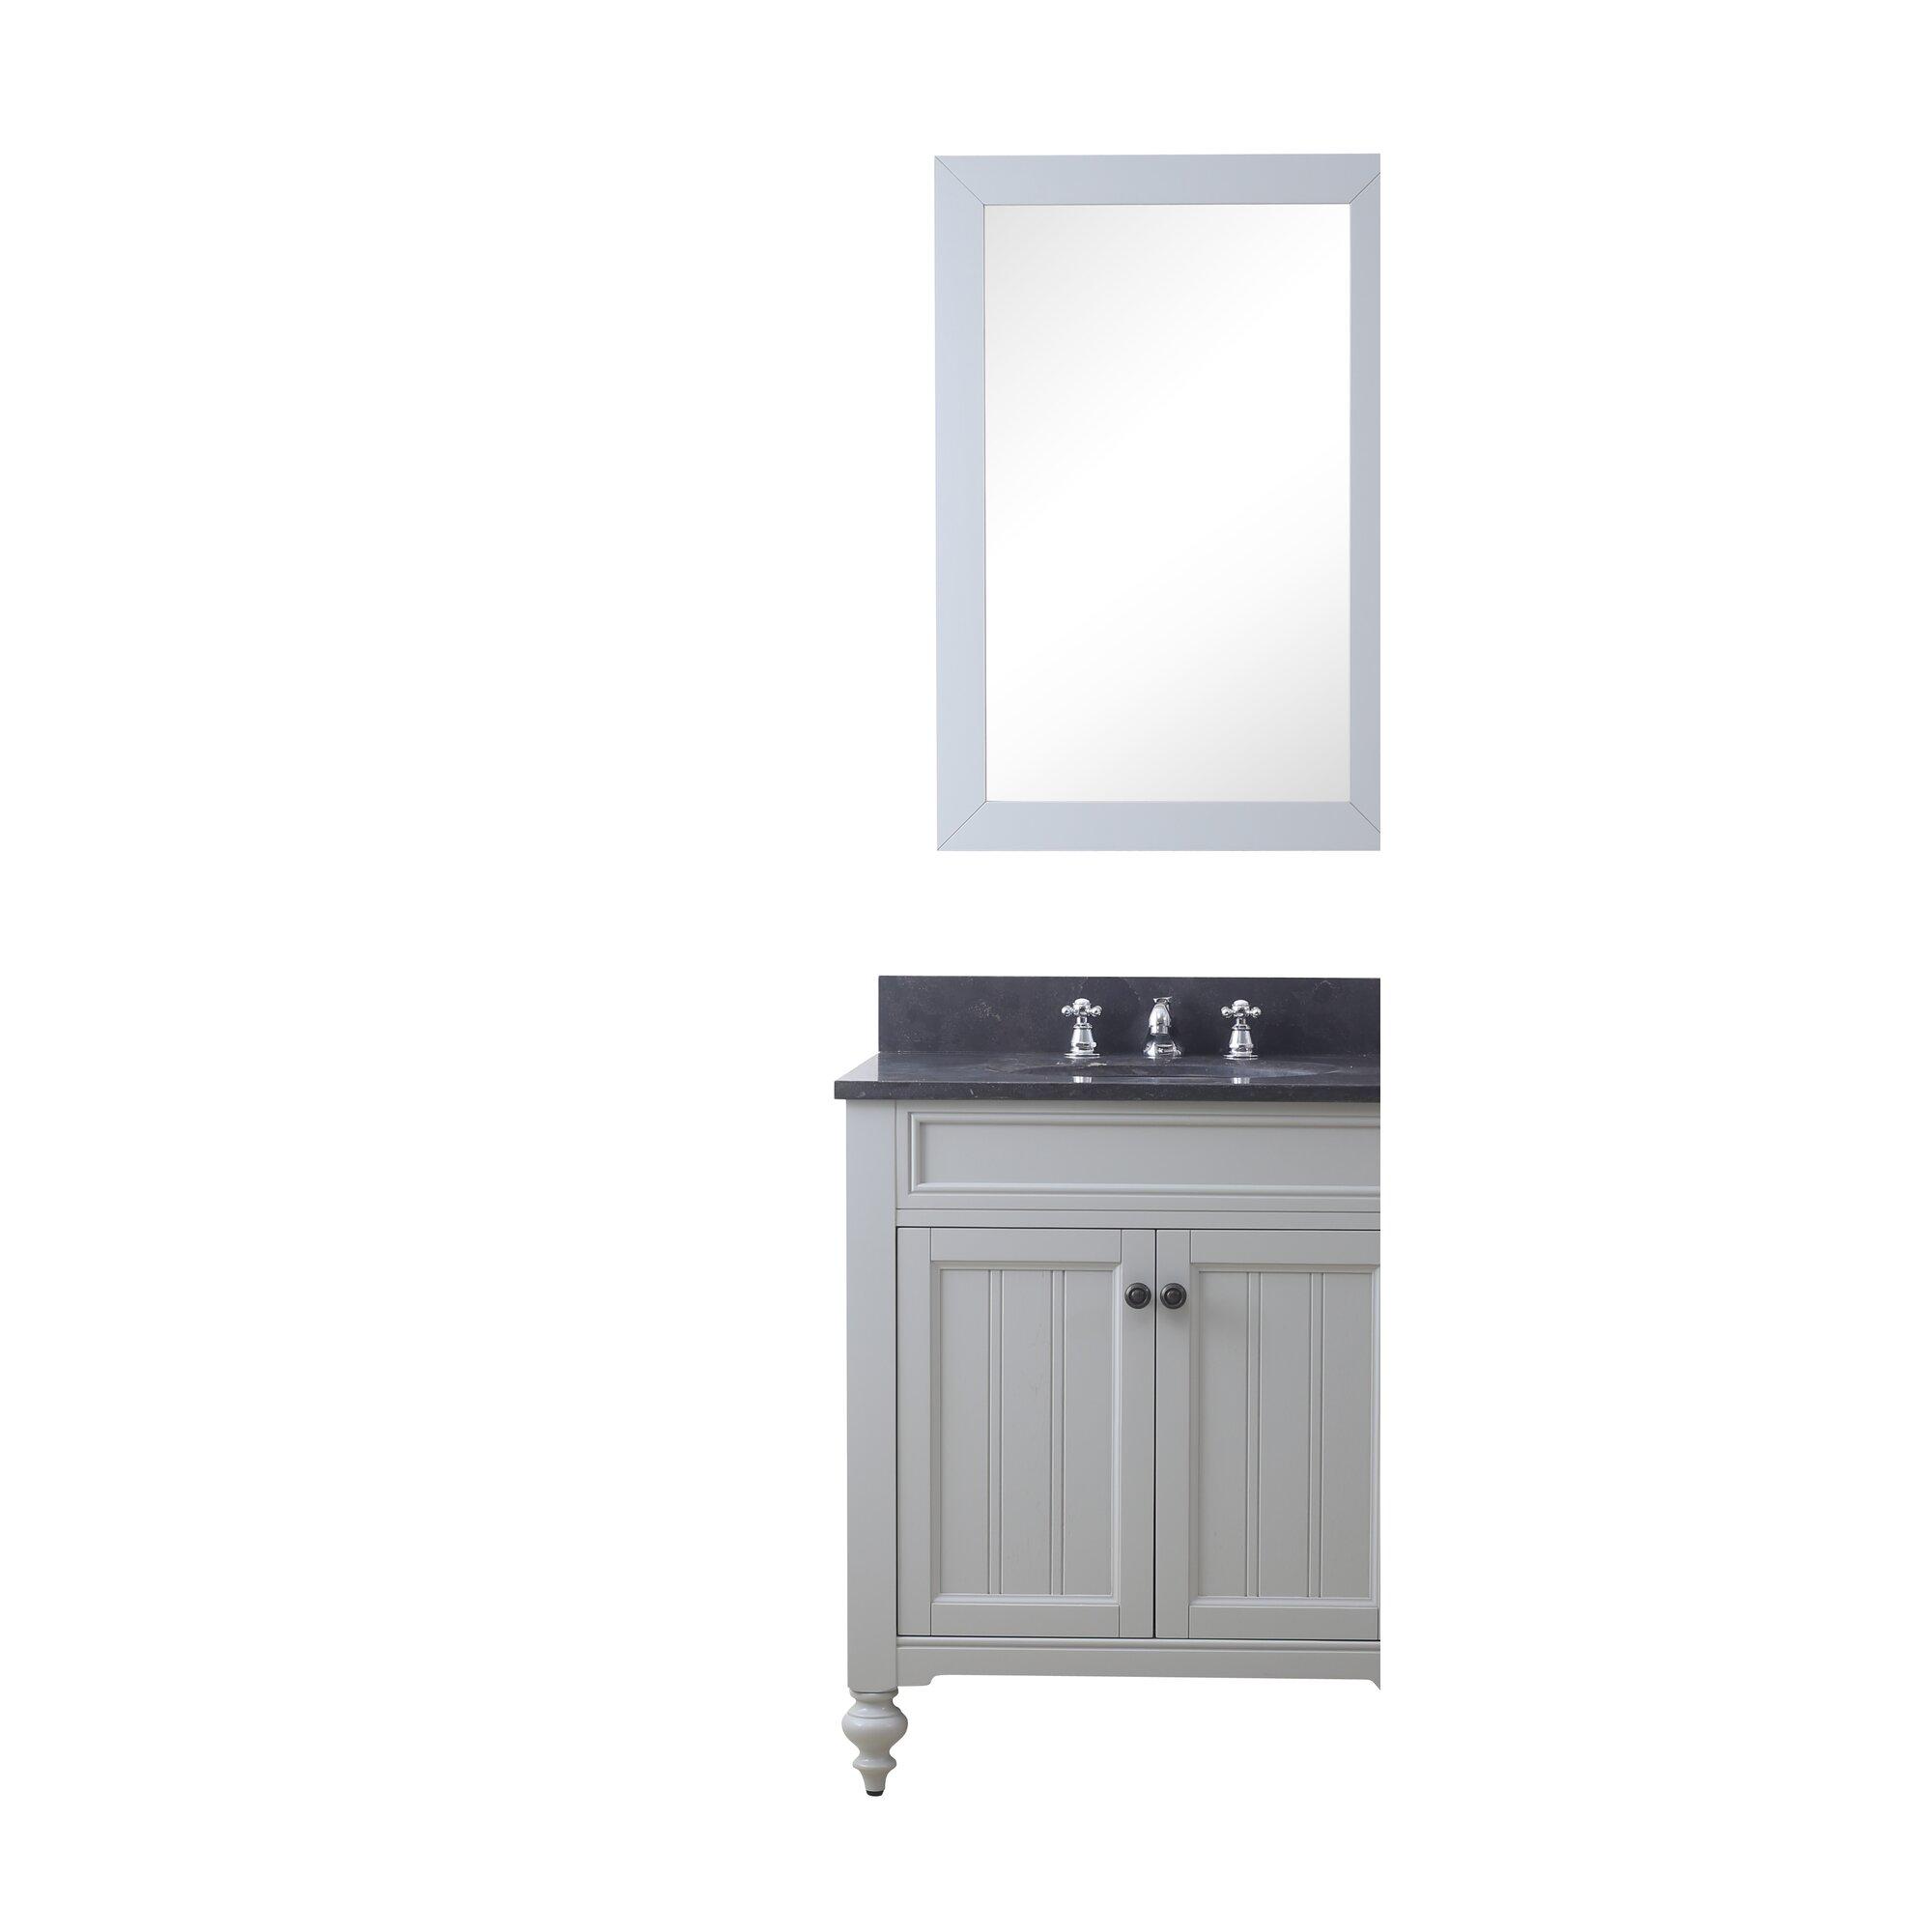 "Bathroom Vanities Quincy Ma latimer 30"" single bathroom vanity set with mirror and faucet"